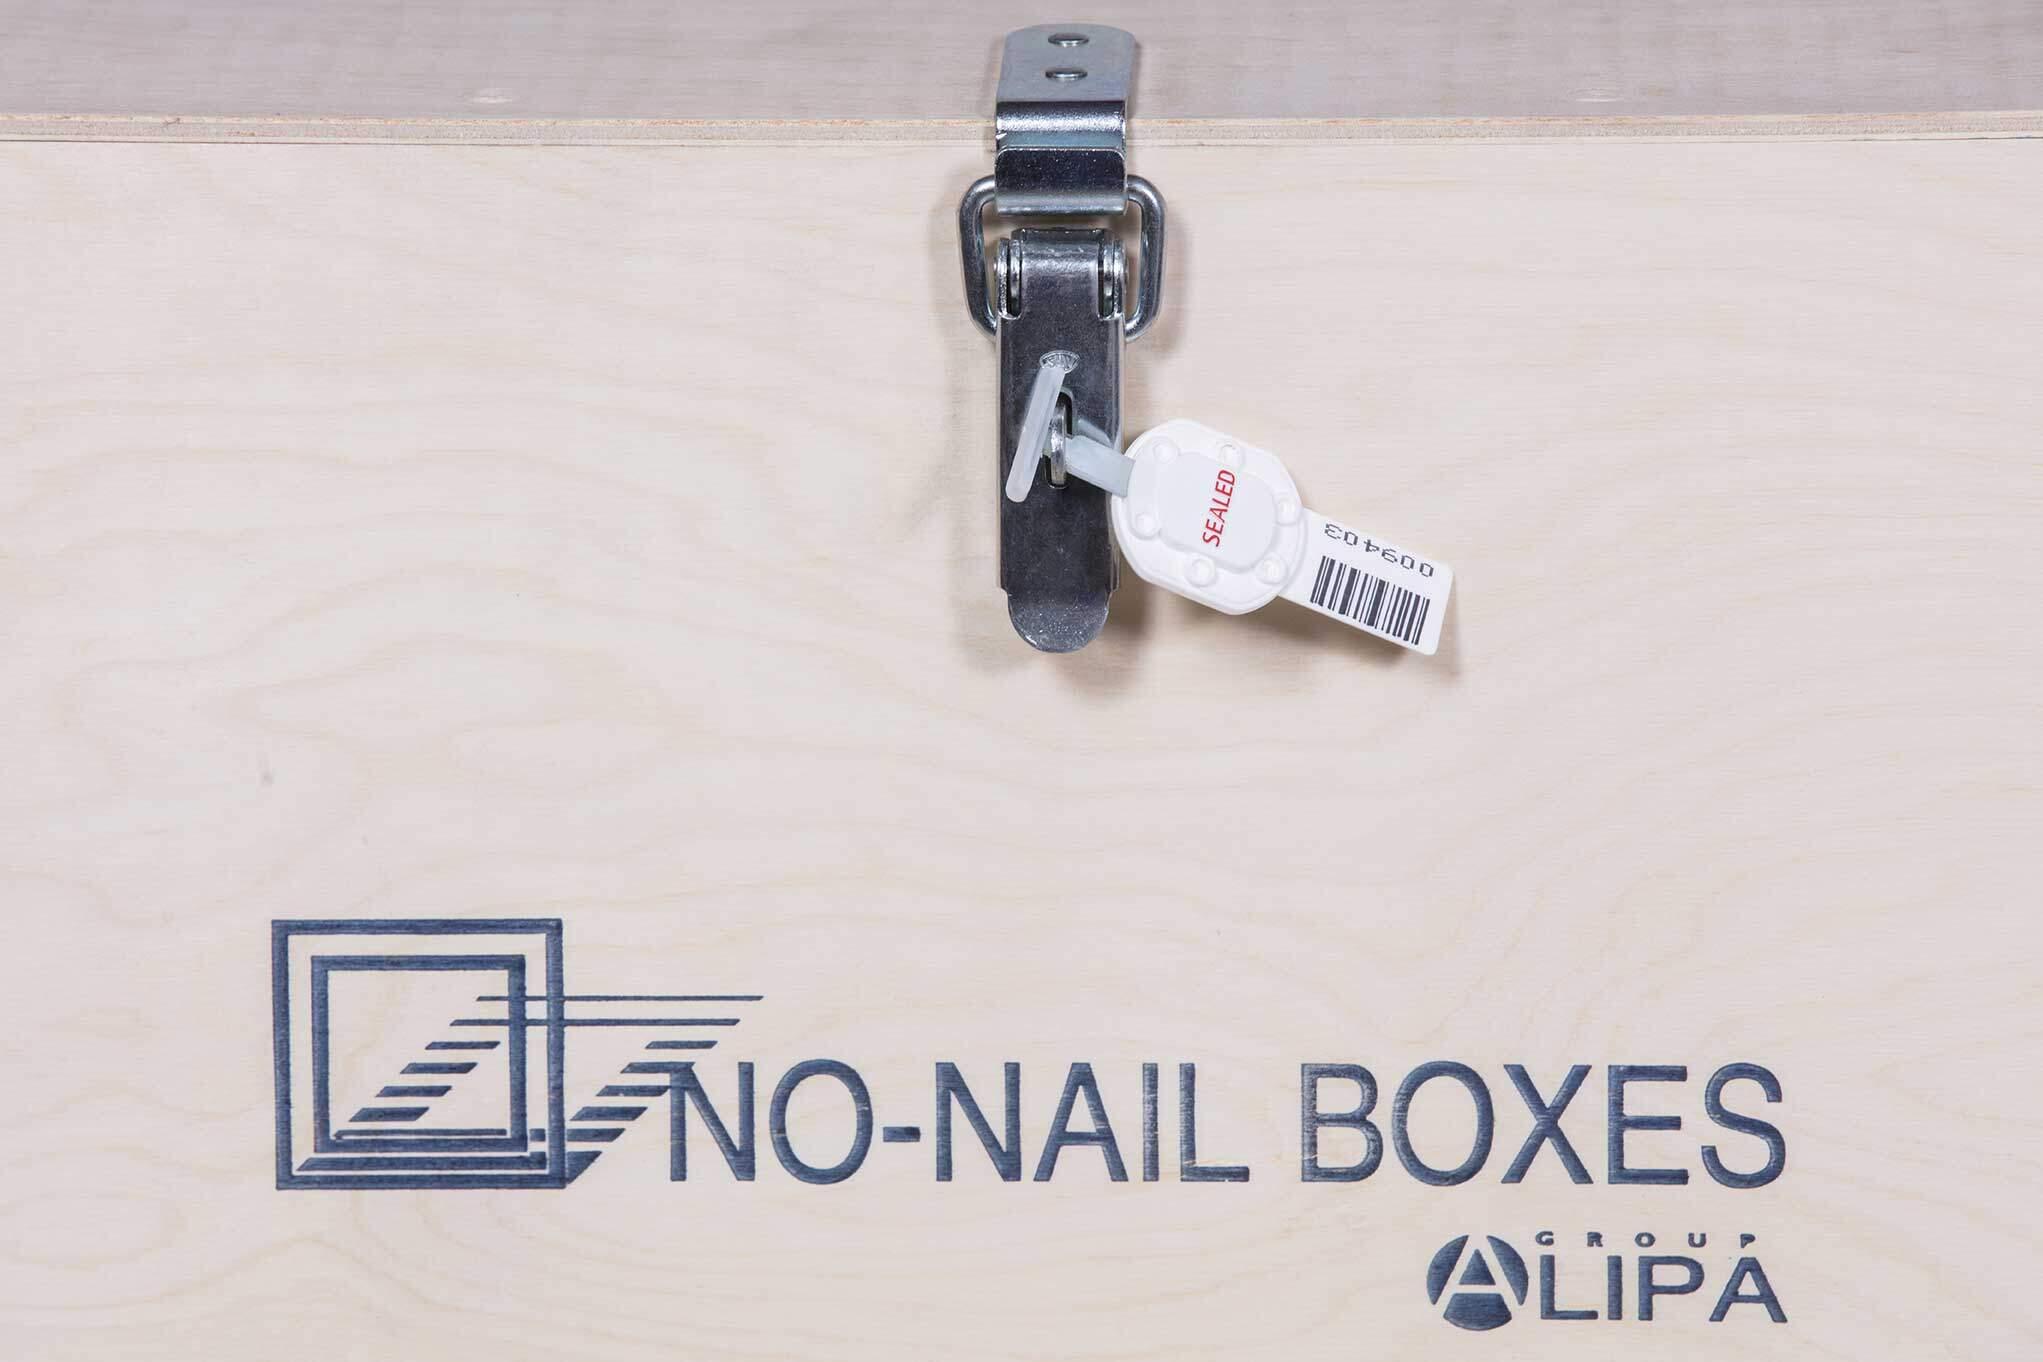 NO-NAIL BOXES: Vatverzegeling